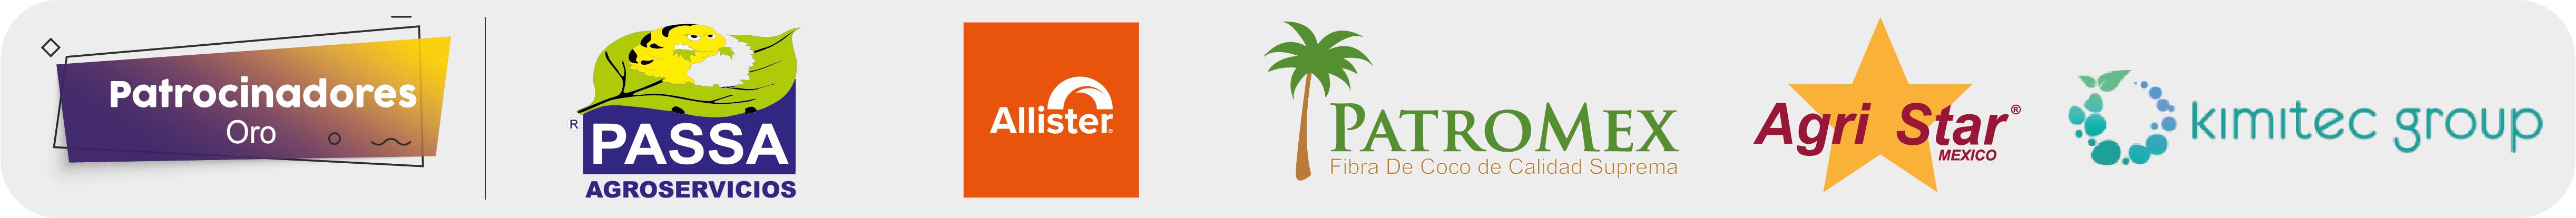 https://fitosanidad.com/wp-content/uploads/2019/07/Slide-Patrocinadores_6.png